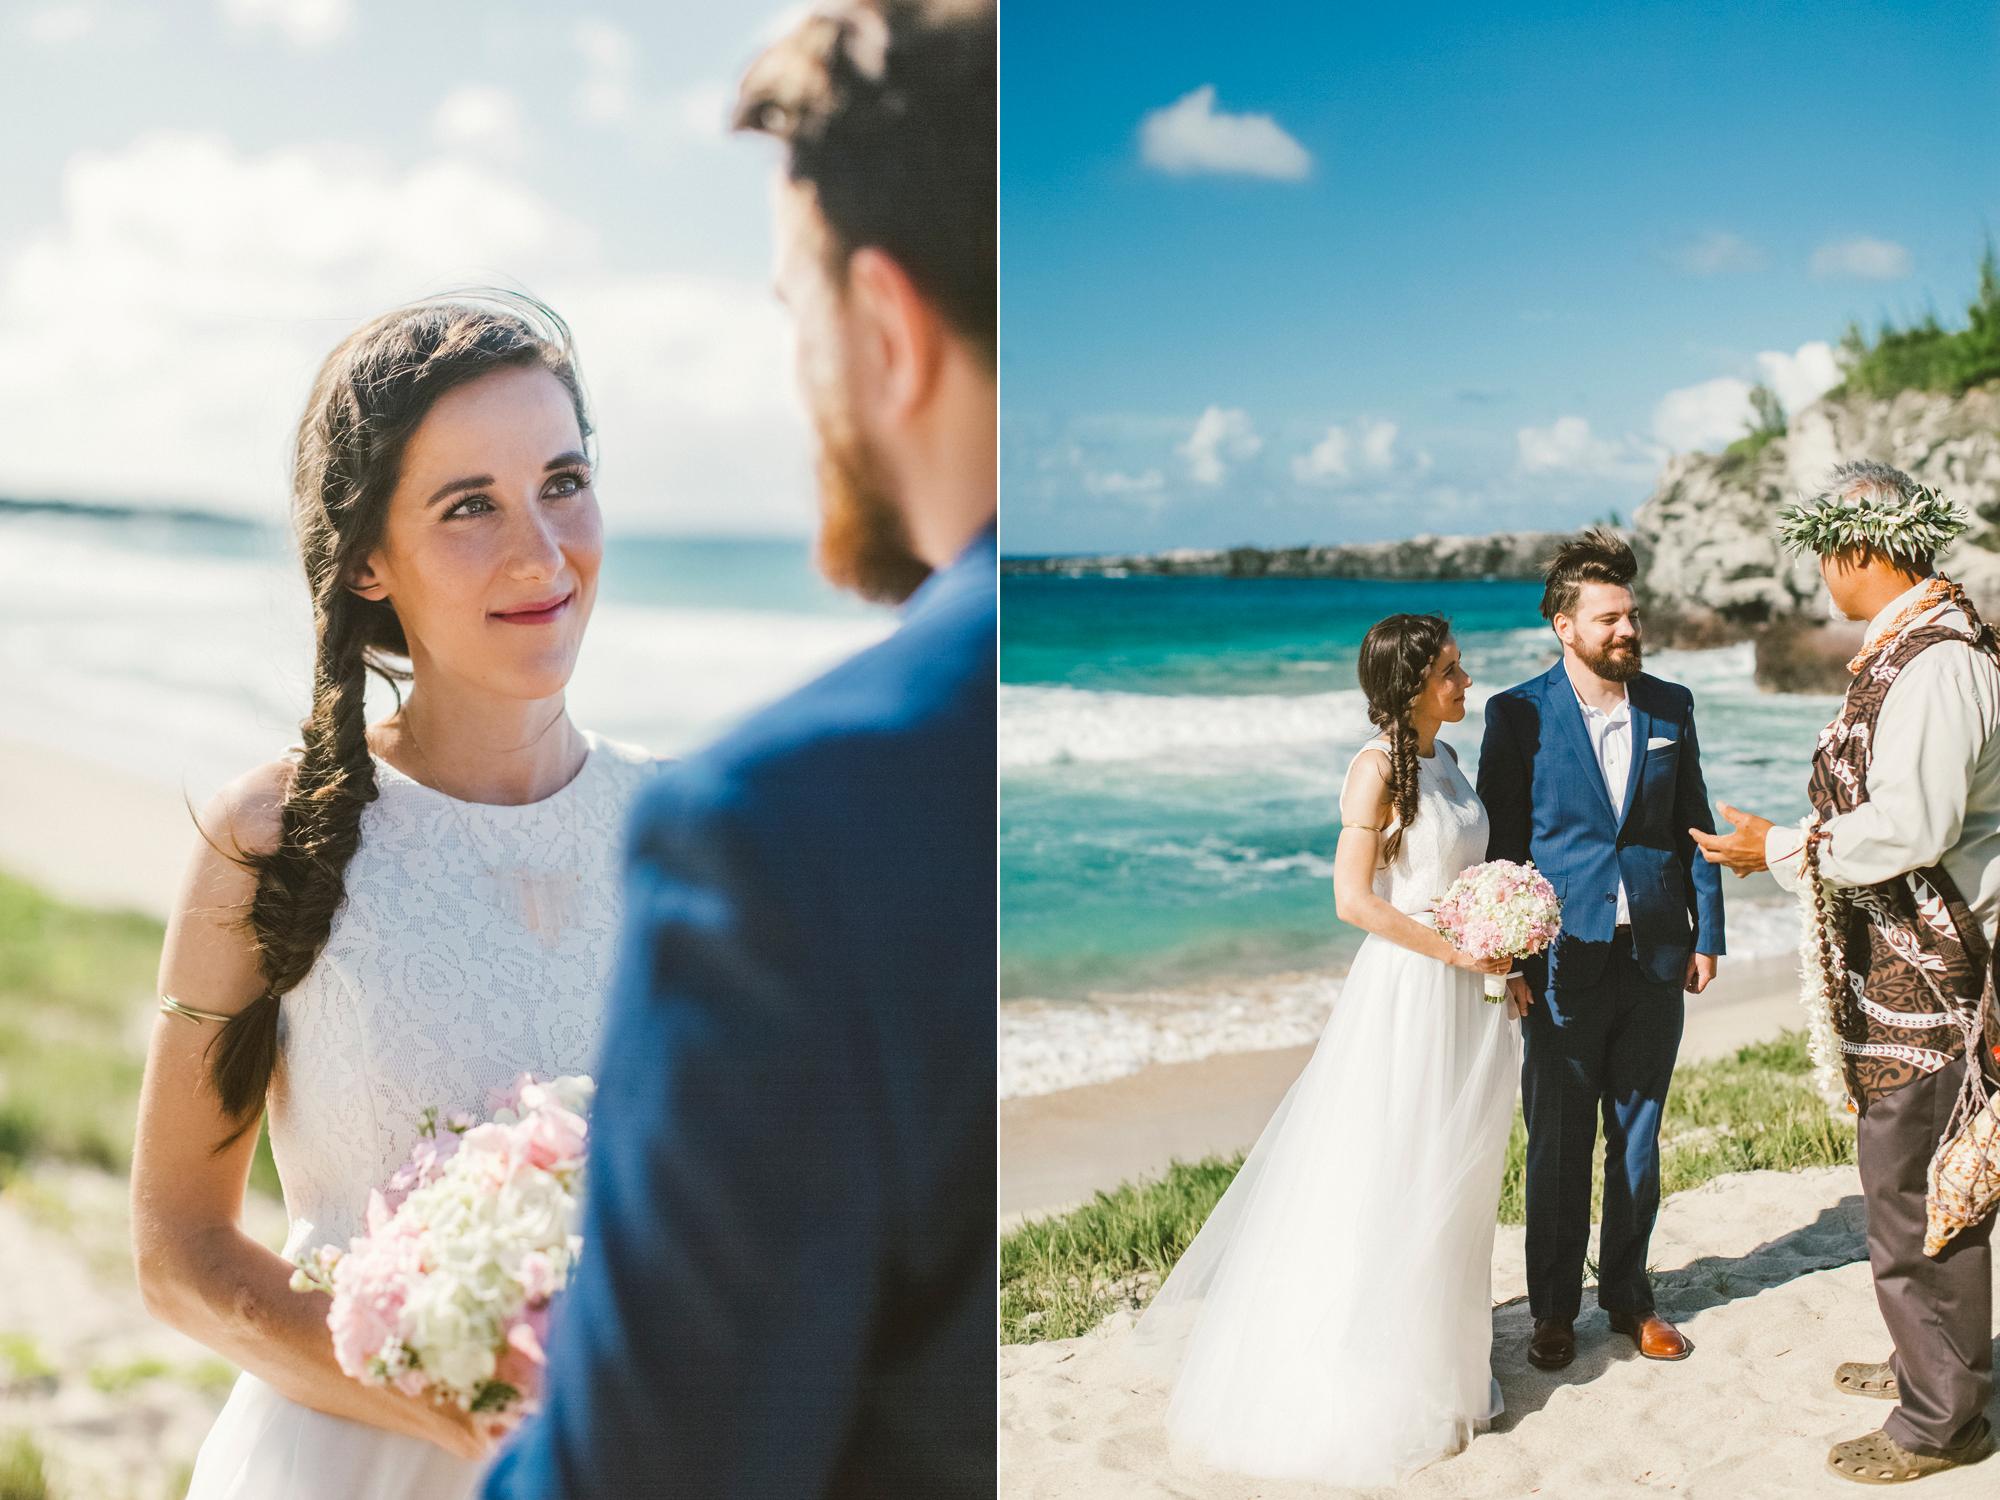 angie-diaz-photography-maui-wedding-ironwoods-beach-12.jpg